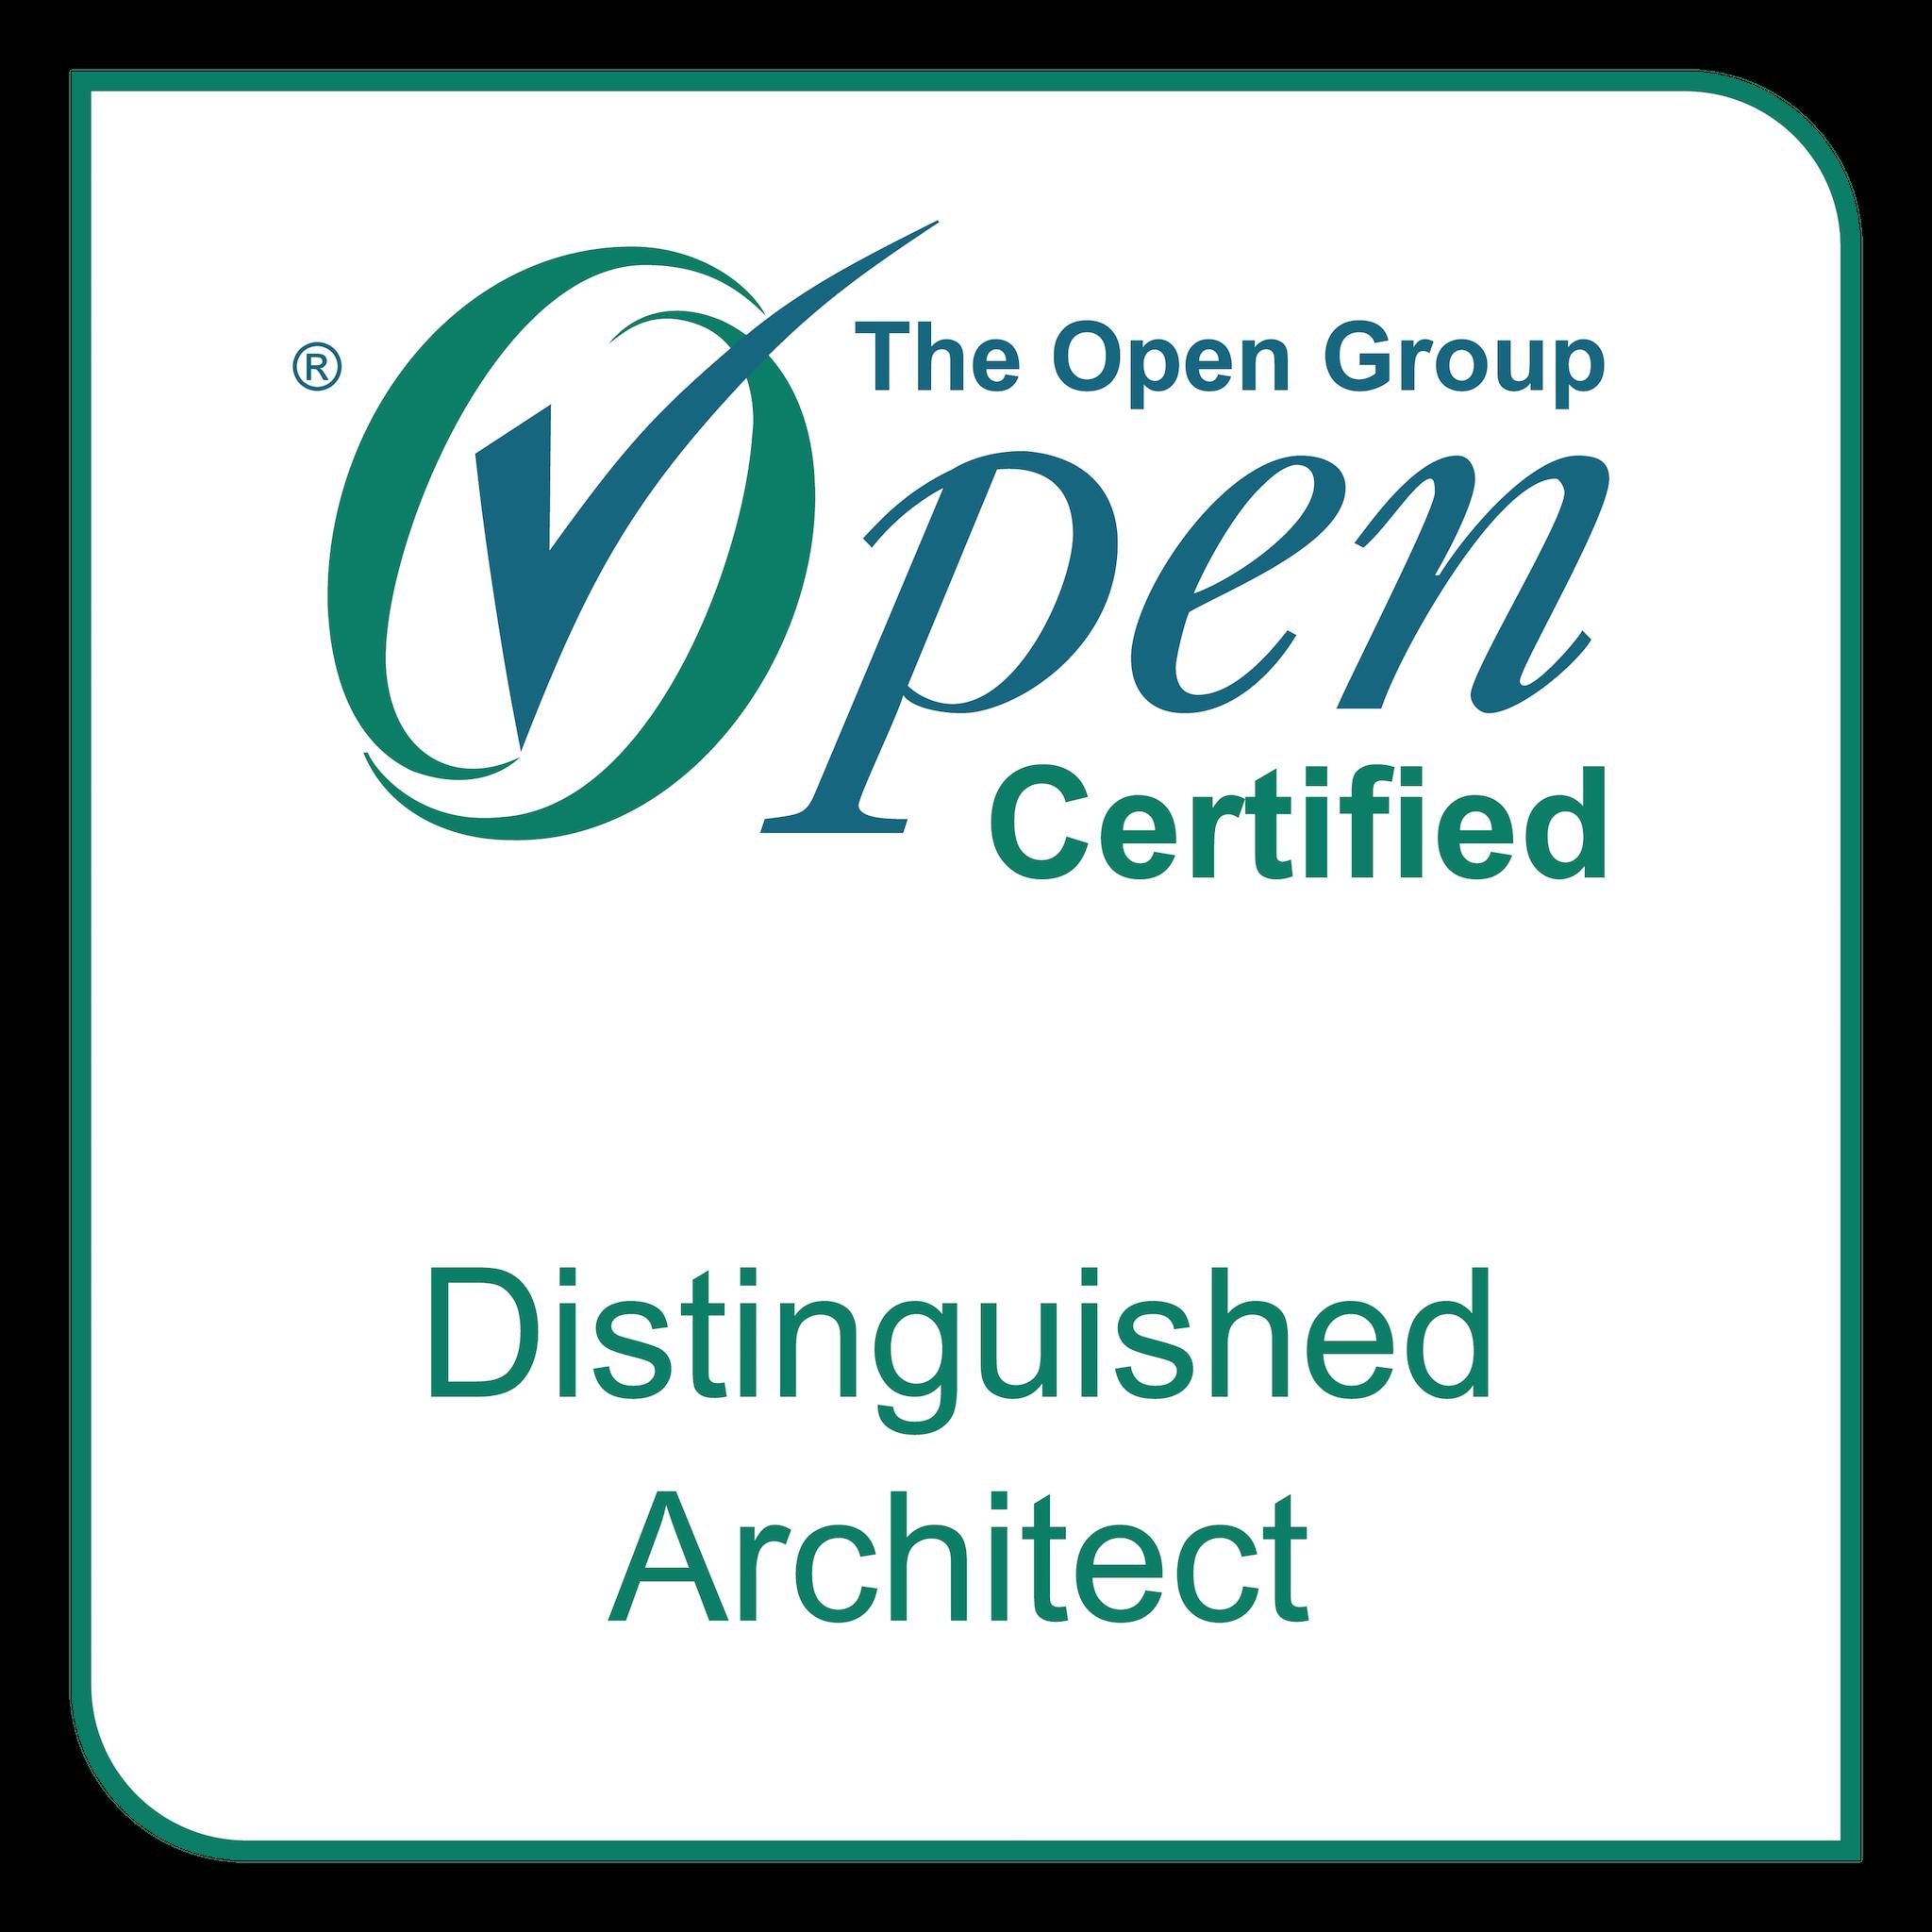 Professional Certification: Level 3 - Distinguished Architect